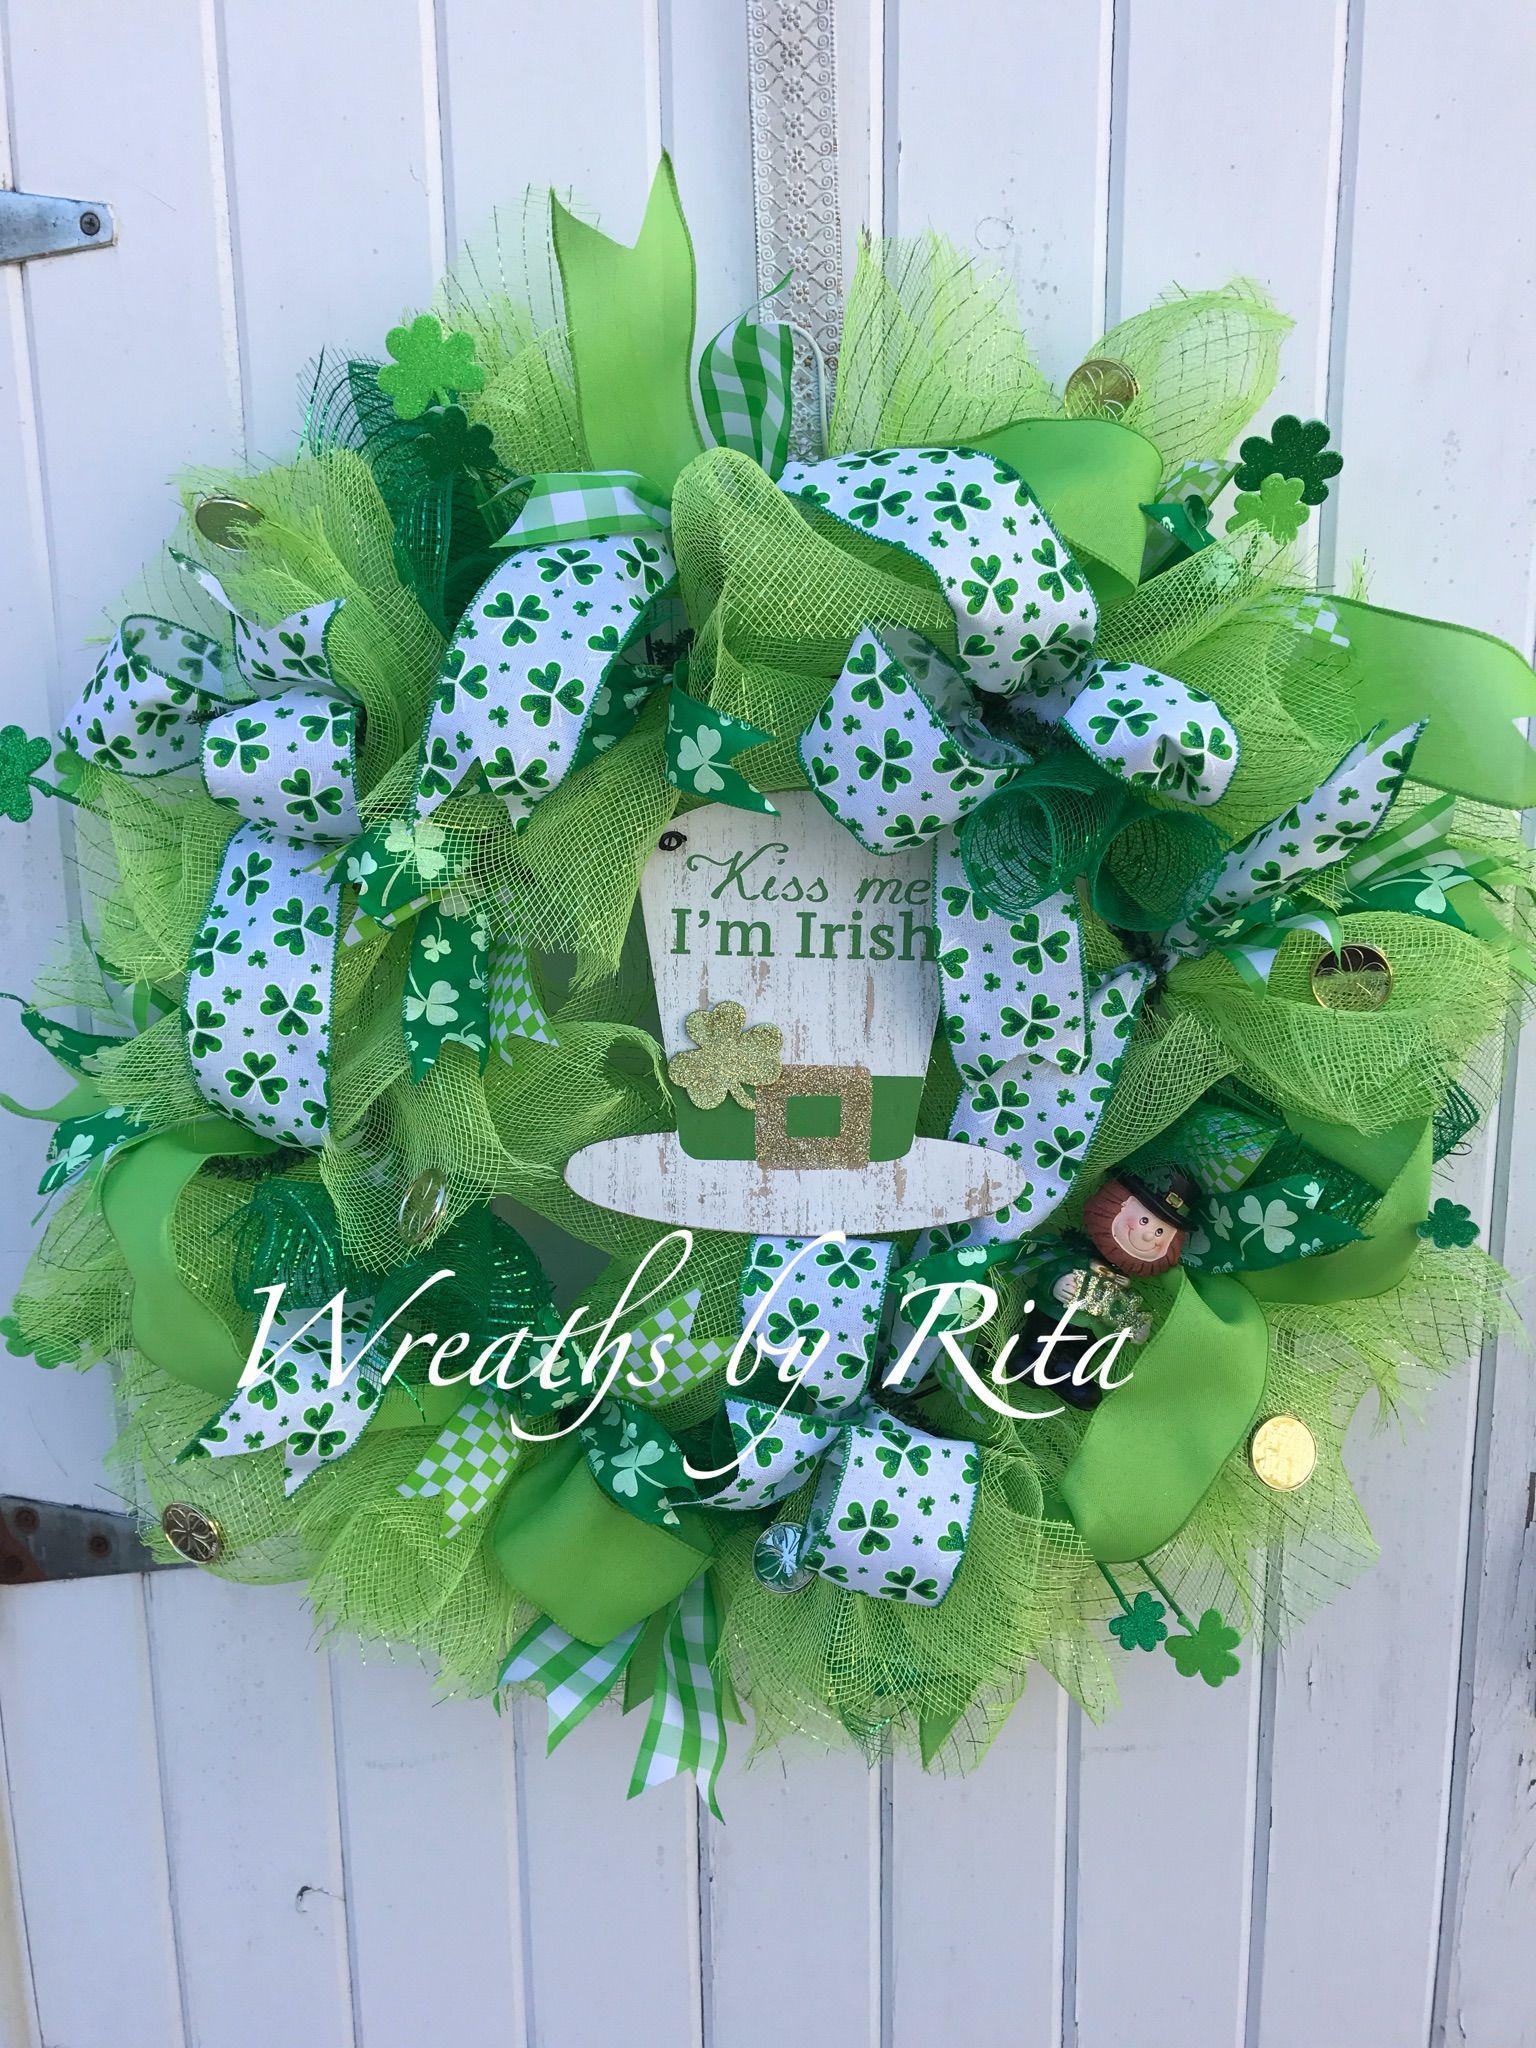 Kiss me I'm Irish! Christmas wreaths, Holiday decor